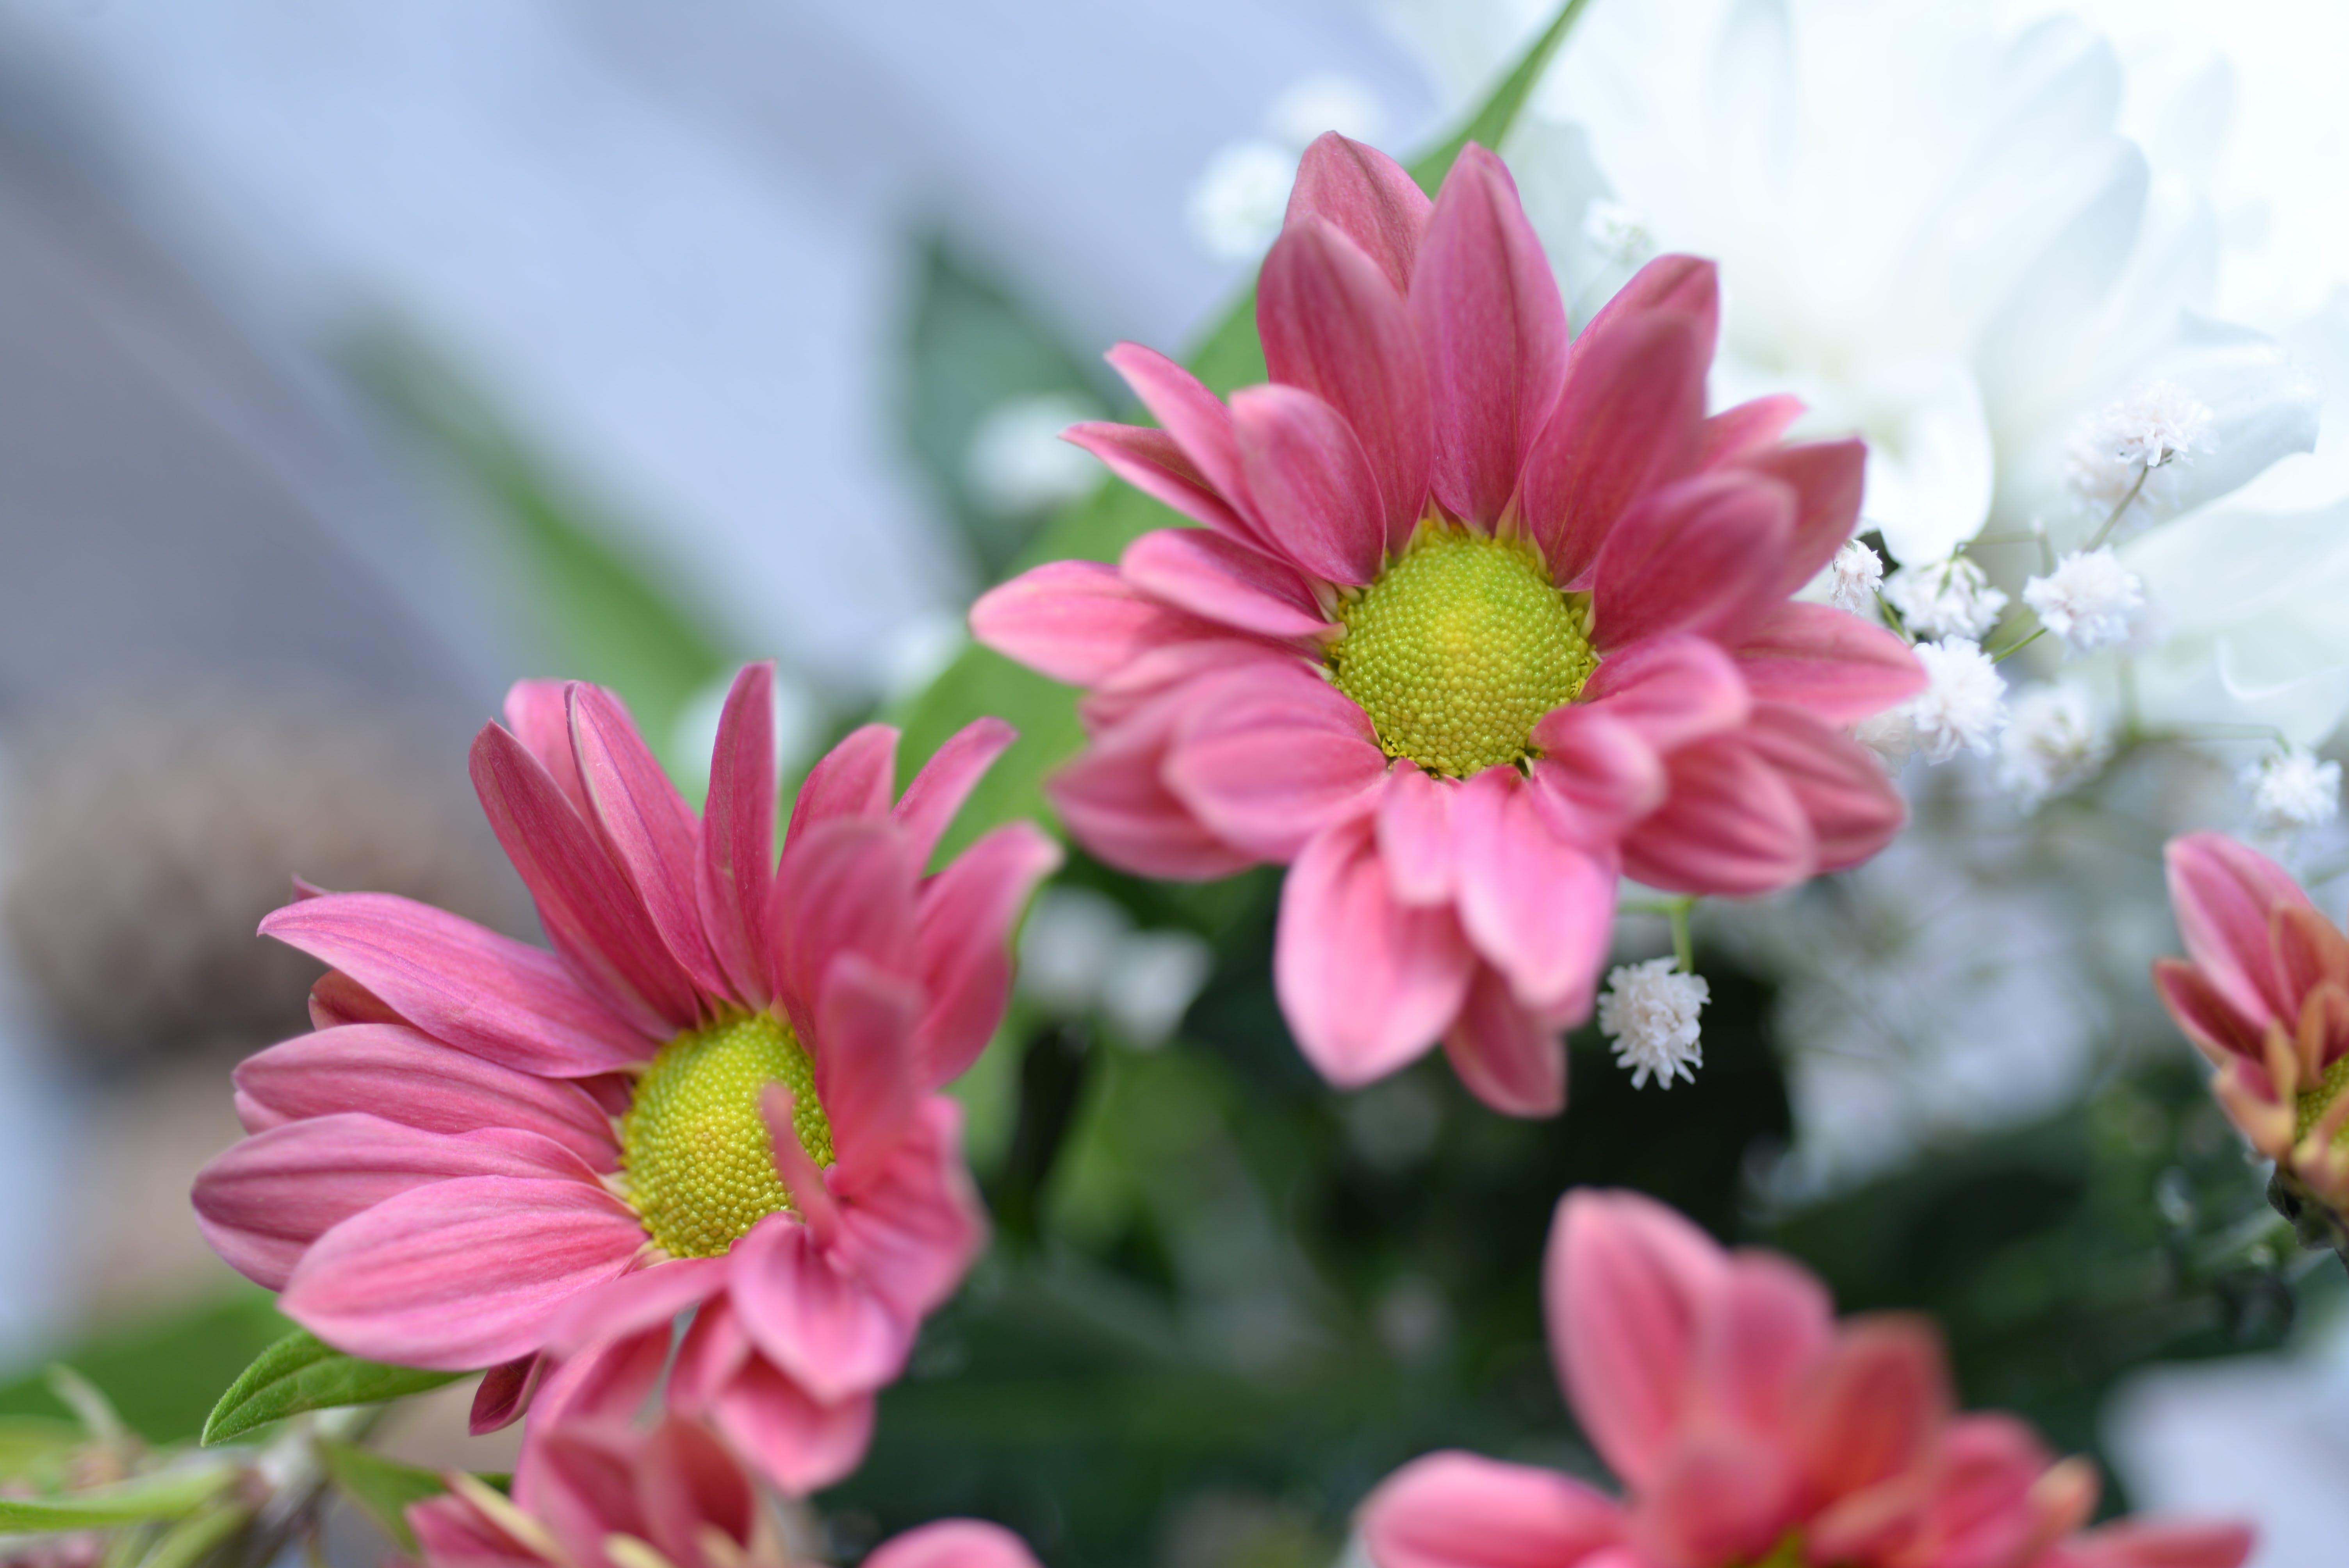 Close-up Photo of Pink Gazania Flower